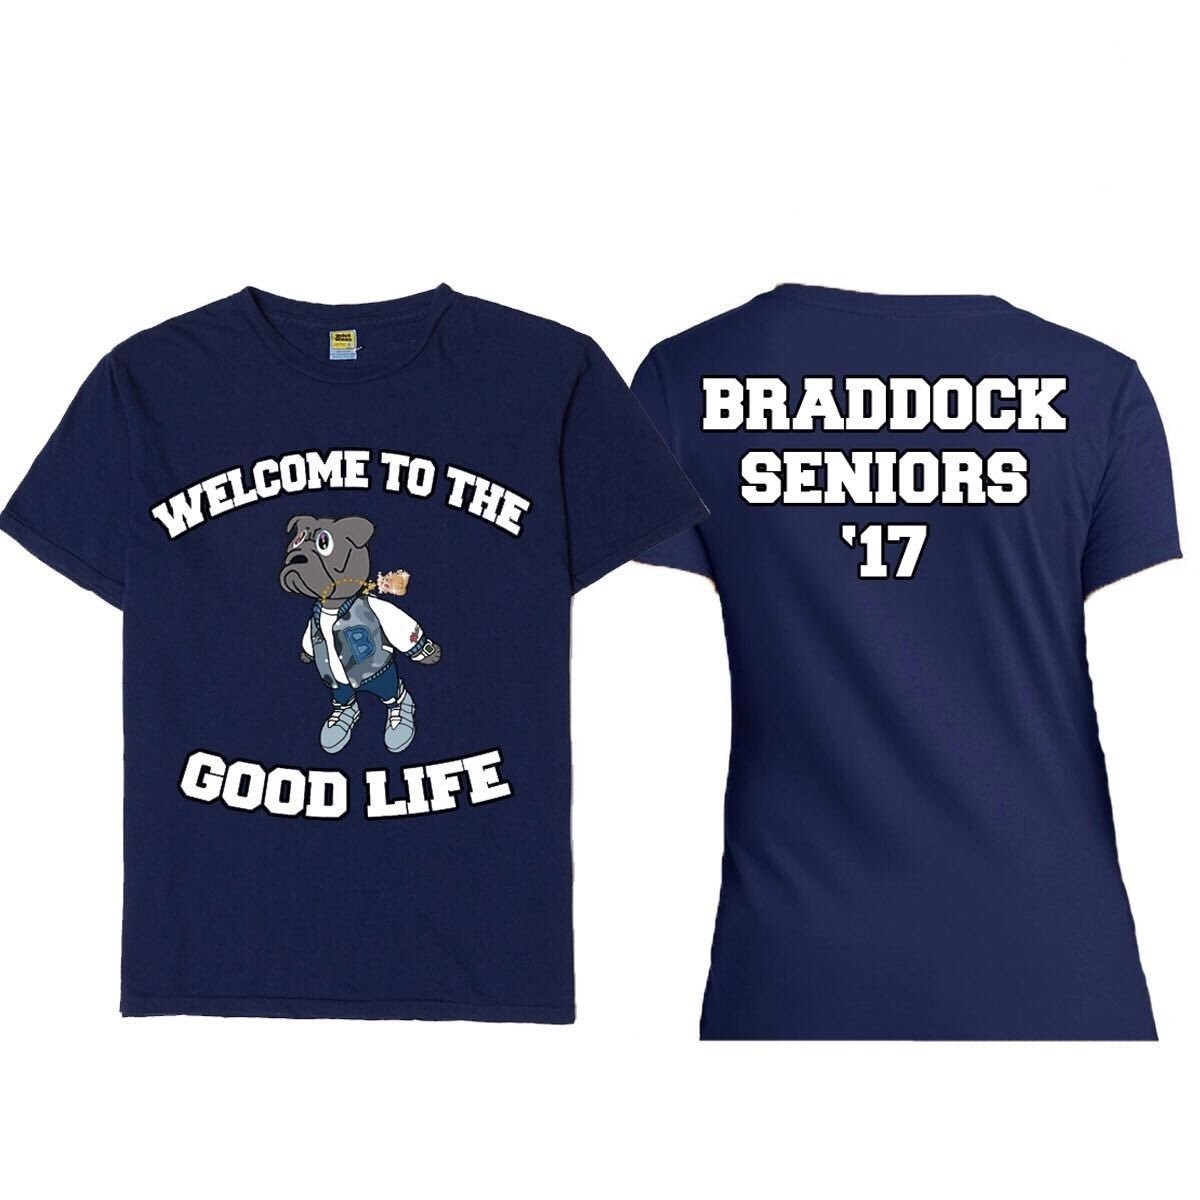 10 Stunning Class Of 2016 Shirt Ideas braddock activities on twitter senior shirt for class of 17 vote 2020